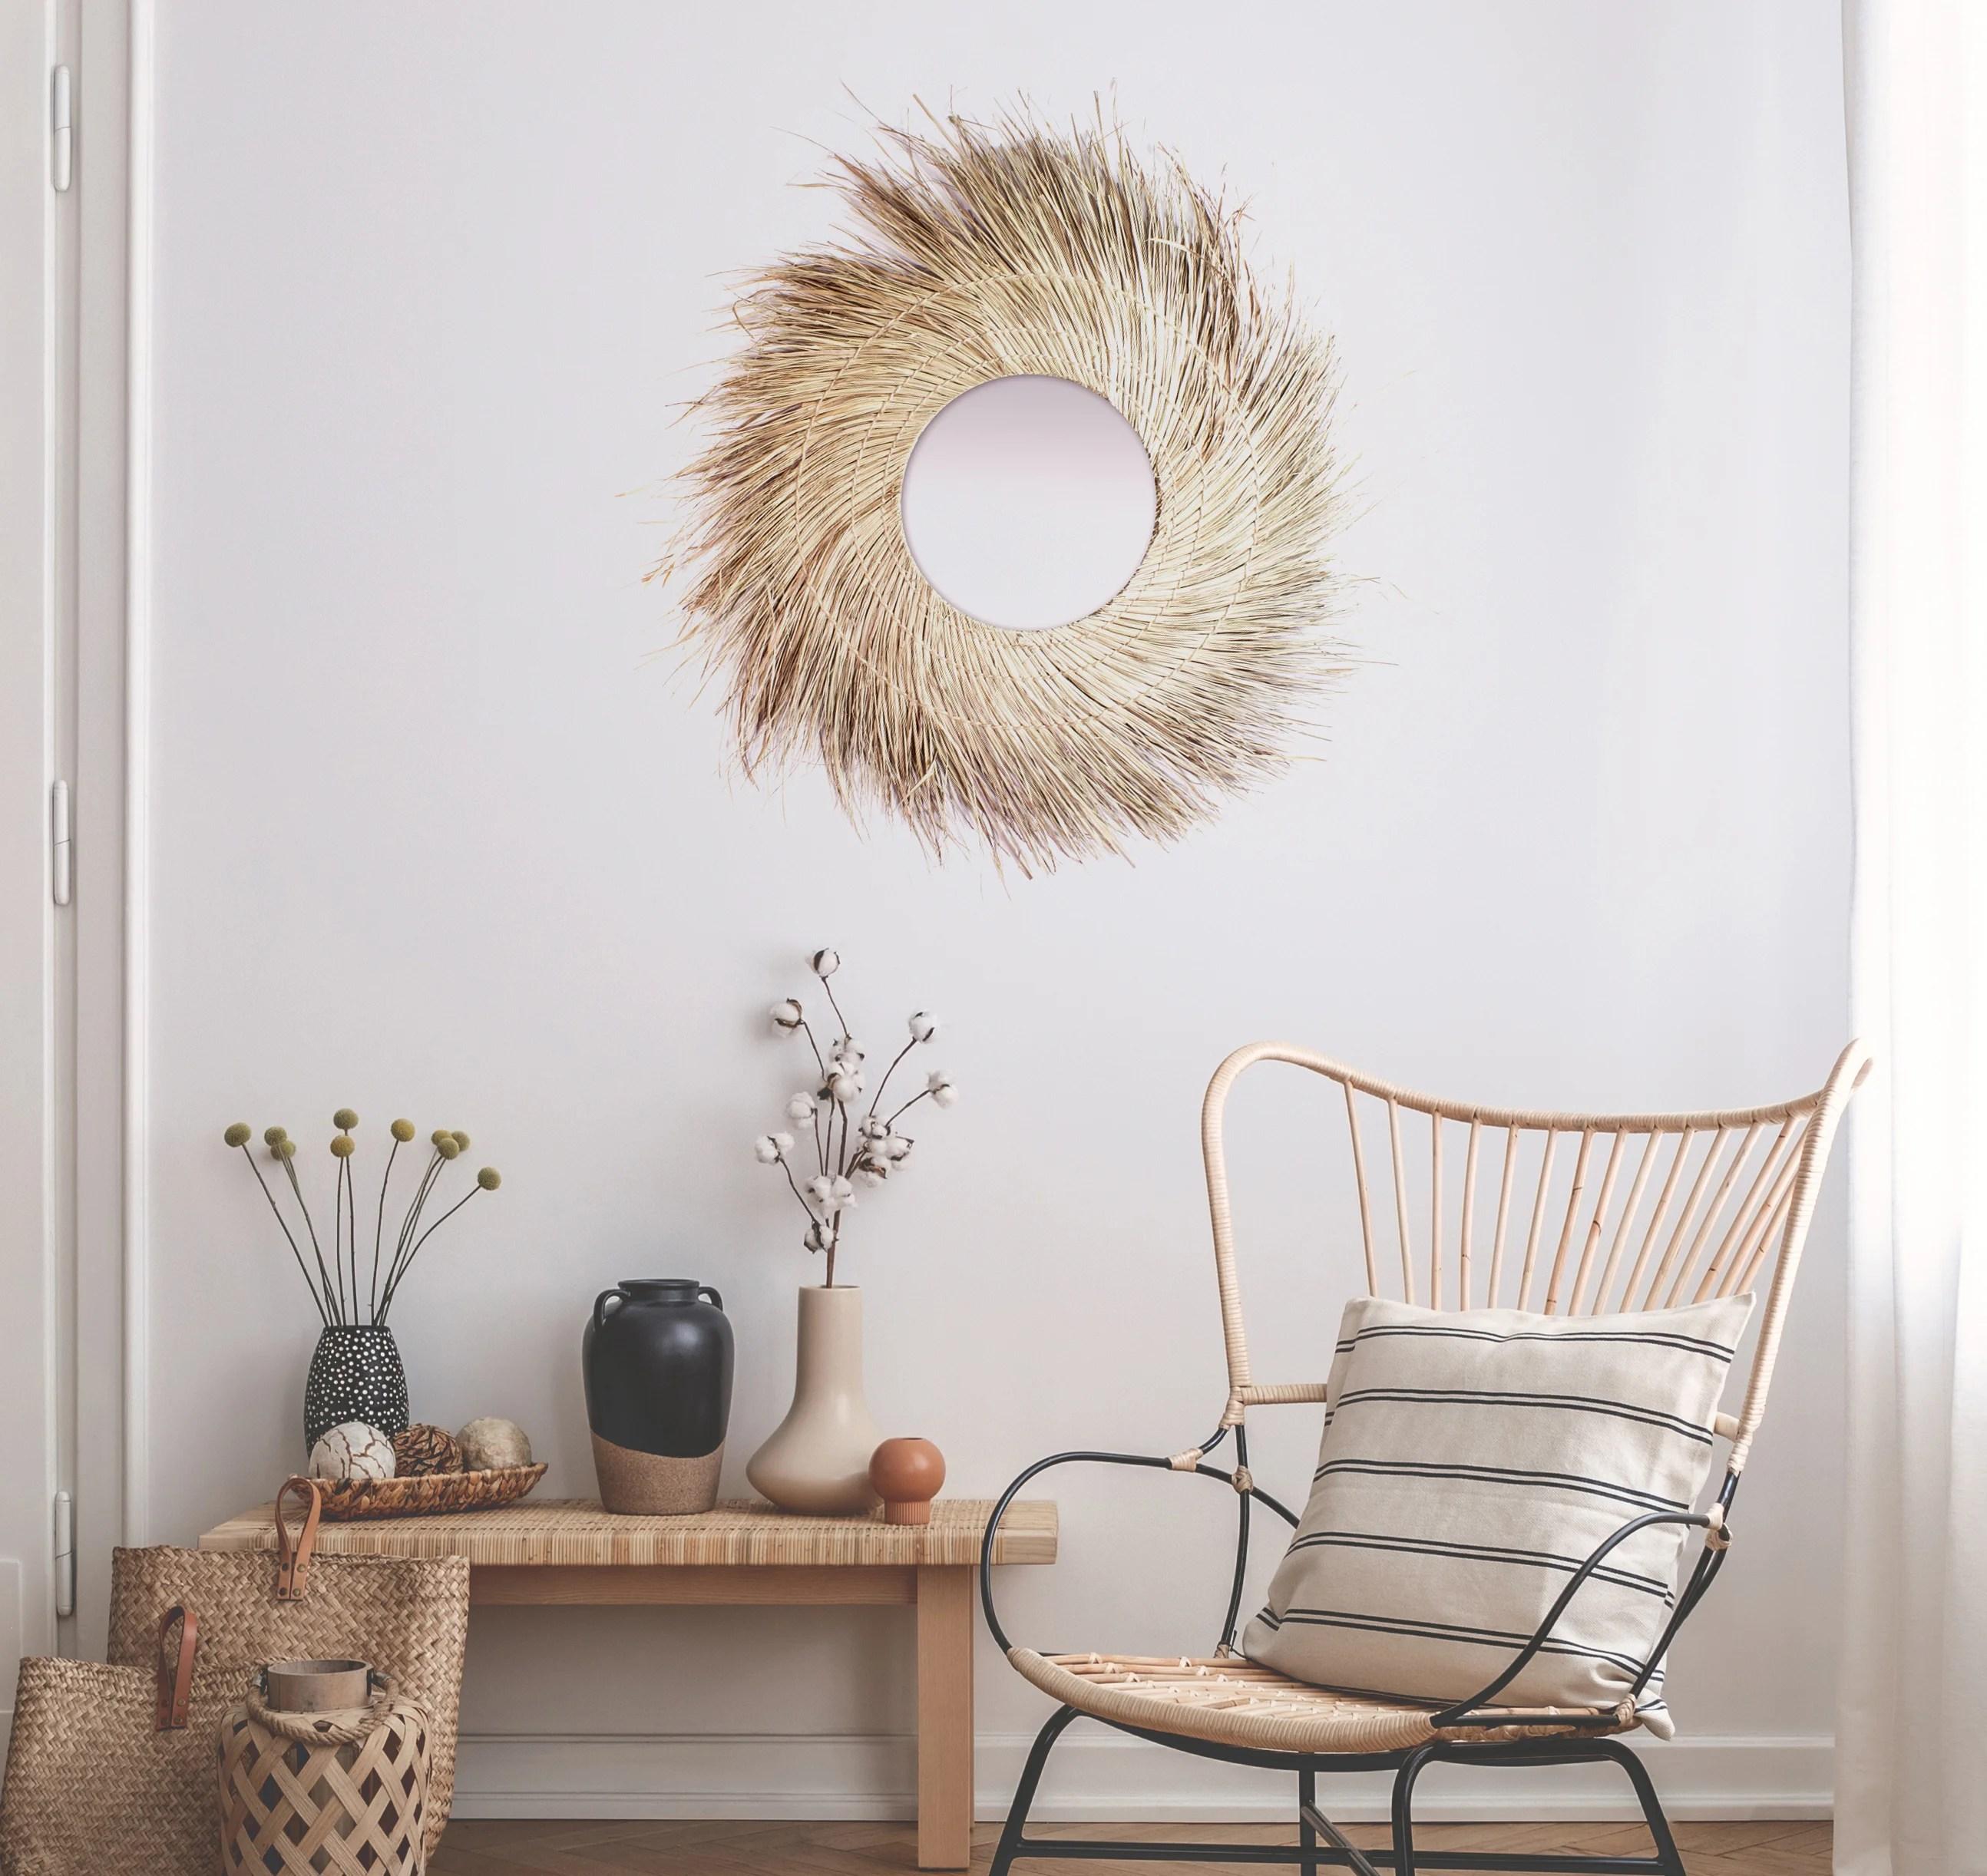 miroir rond fibre coco naturel diam 90 cm leroy merlin